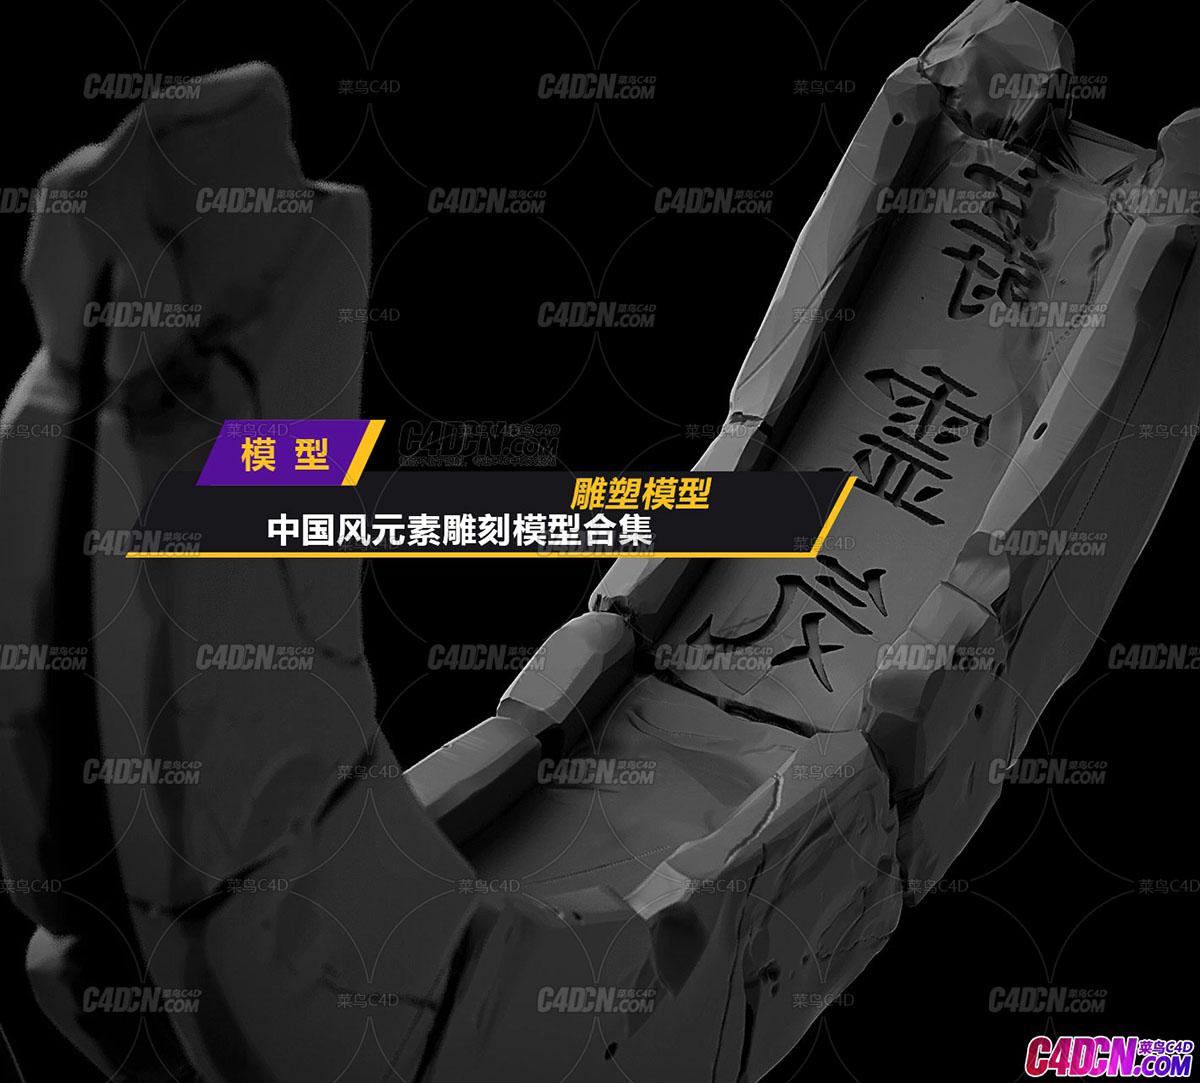 China_enverement_stones.jpg